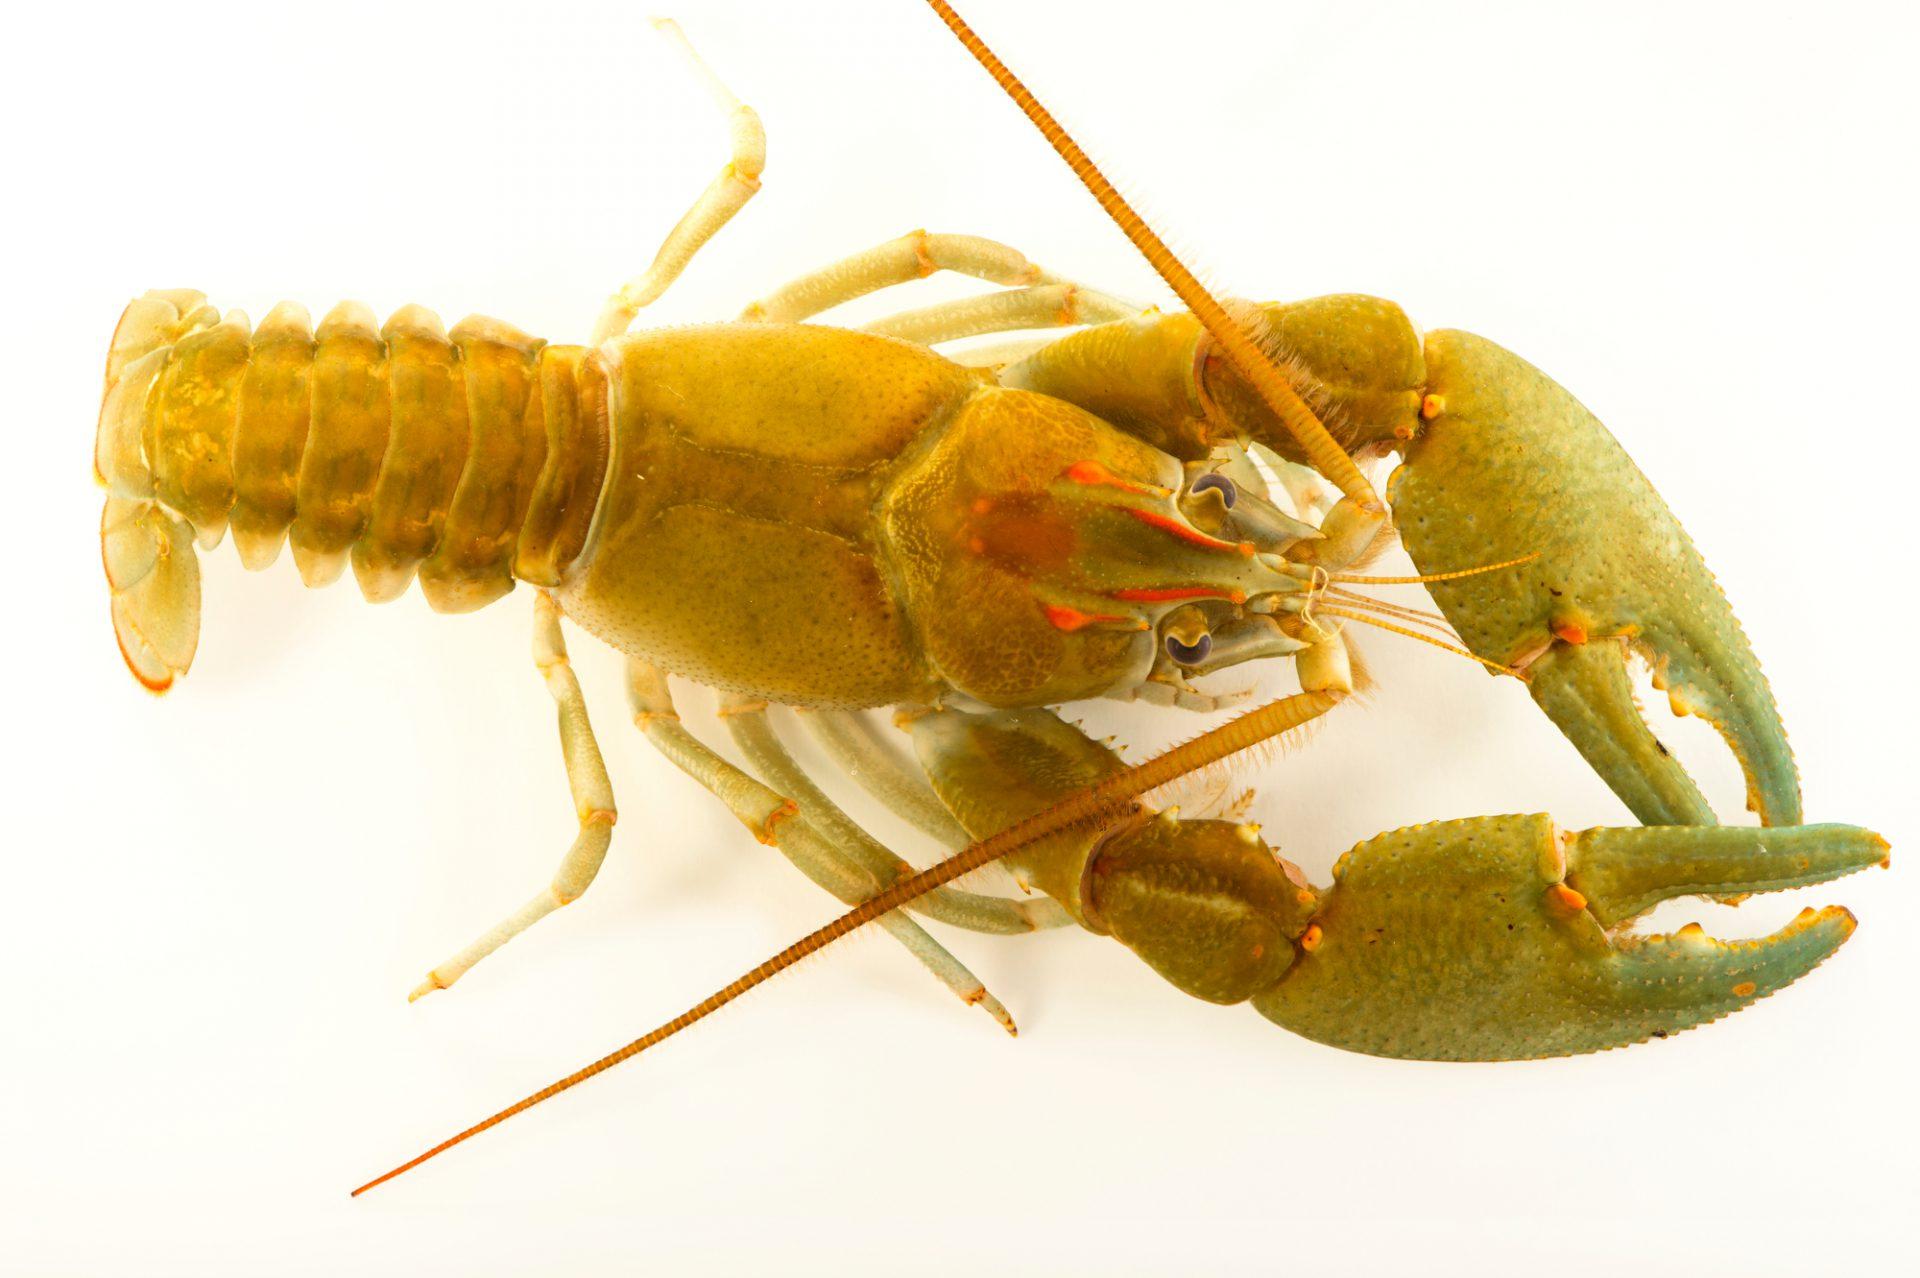 Photo: A Bottlebrush crayfish, Barbicambarus cornutus, wild caught near West Liberty, West Virginia.